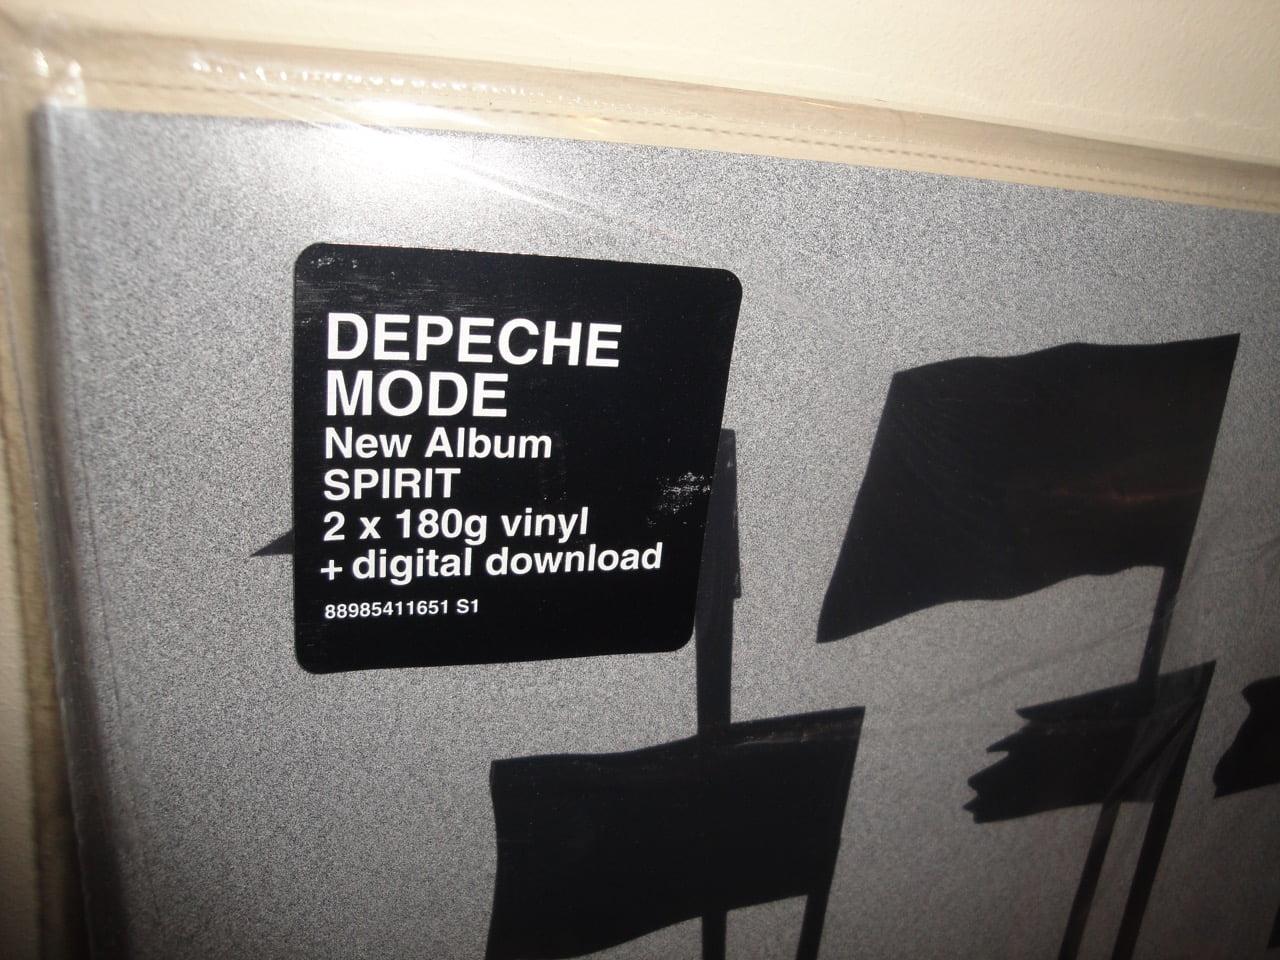 Depeche Mode - Spirit - 2XLP 180 Gram Vinyl, Gatefold w Download